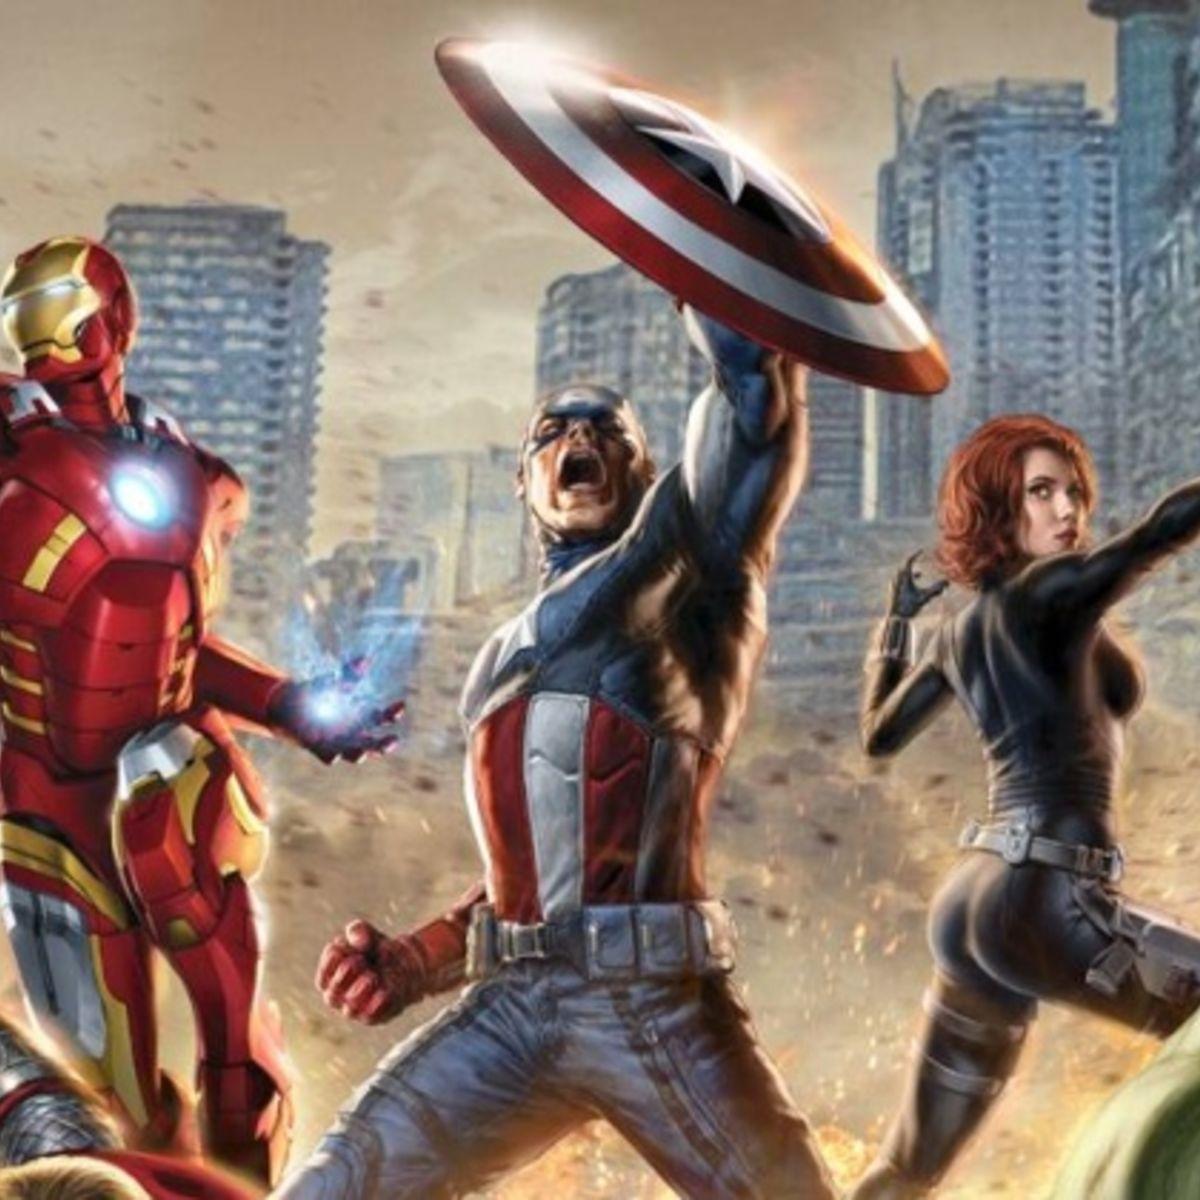 AvengersActionPromoArt1.jpg